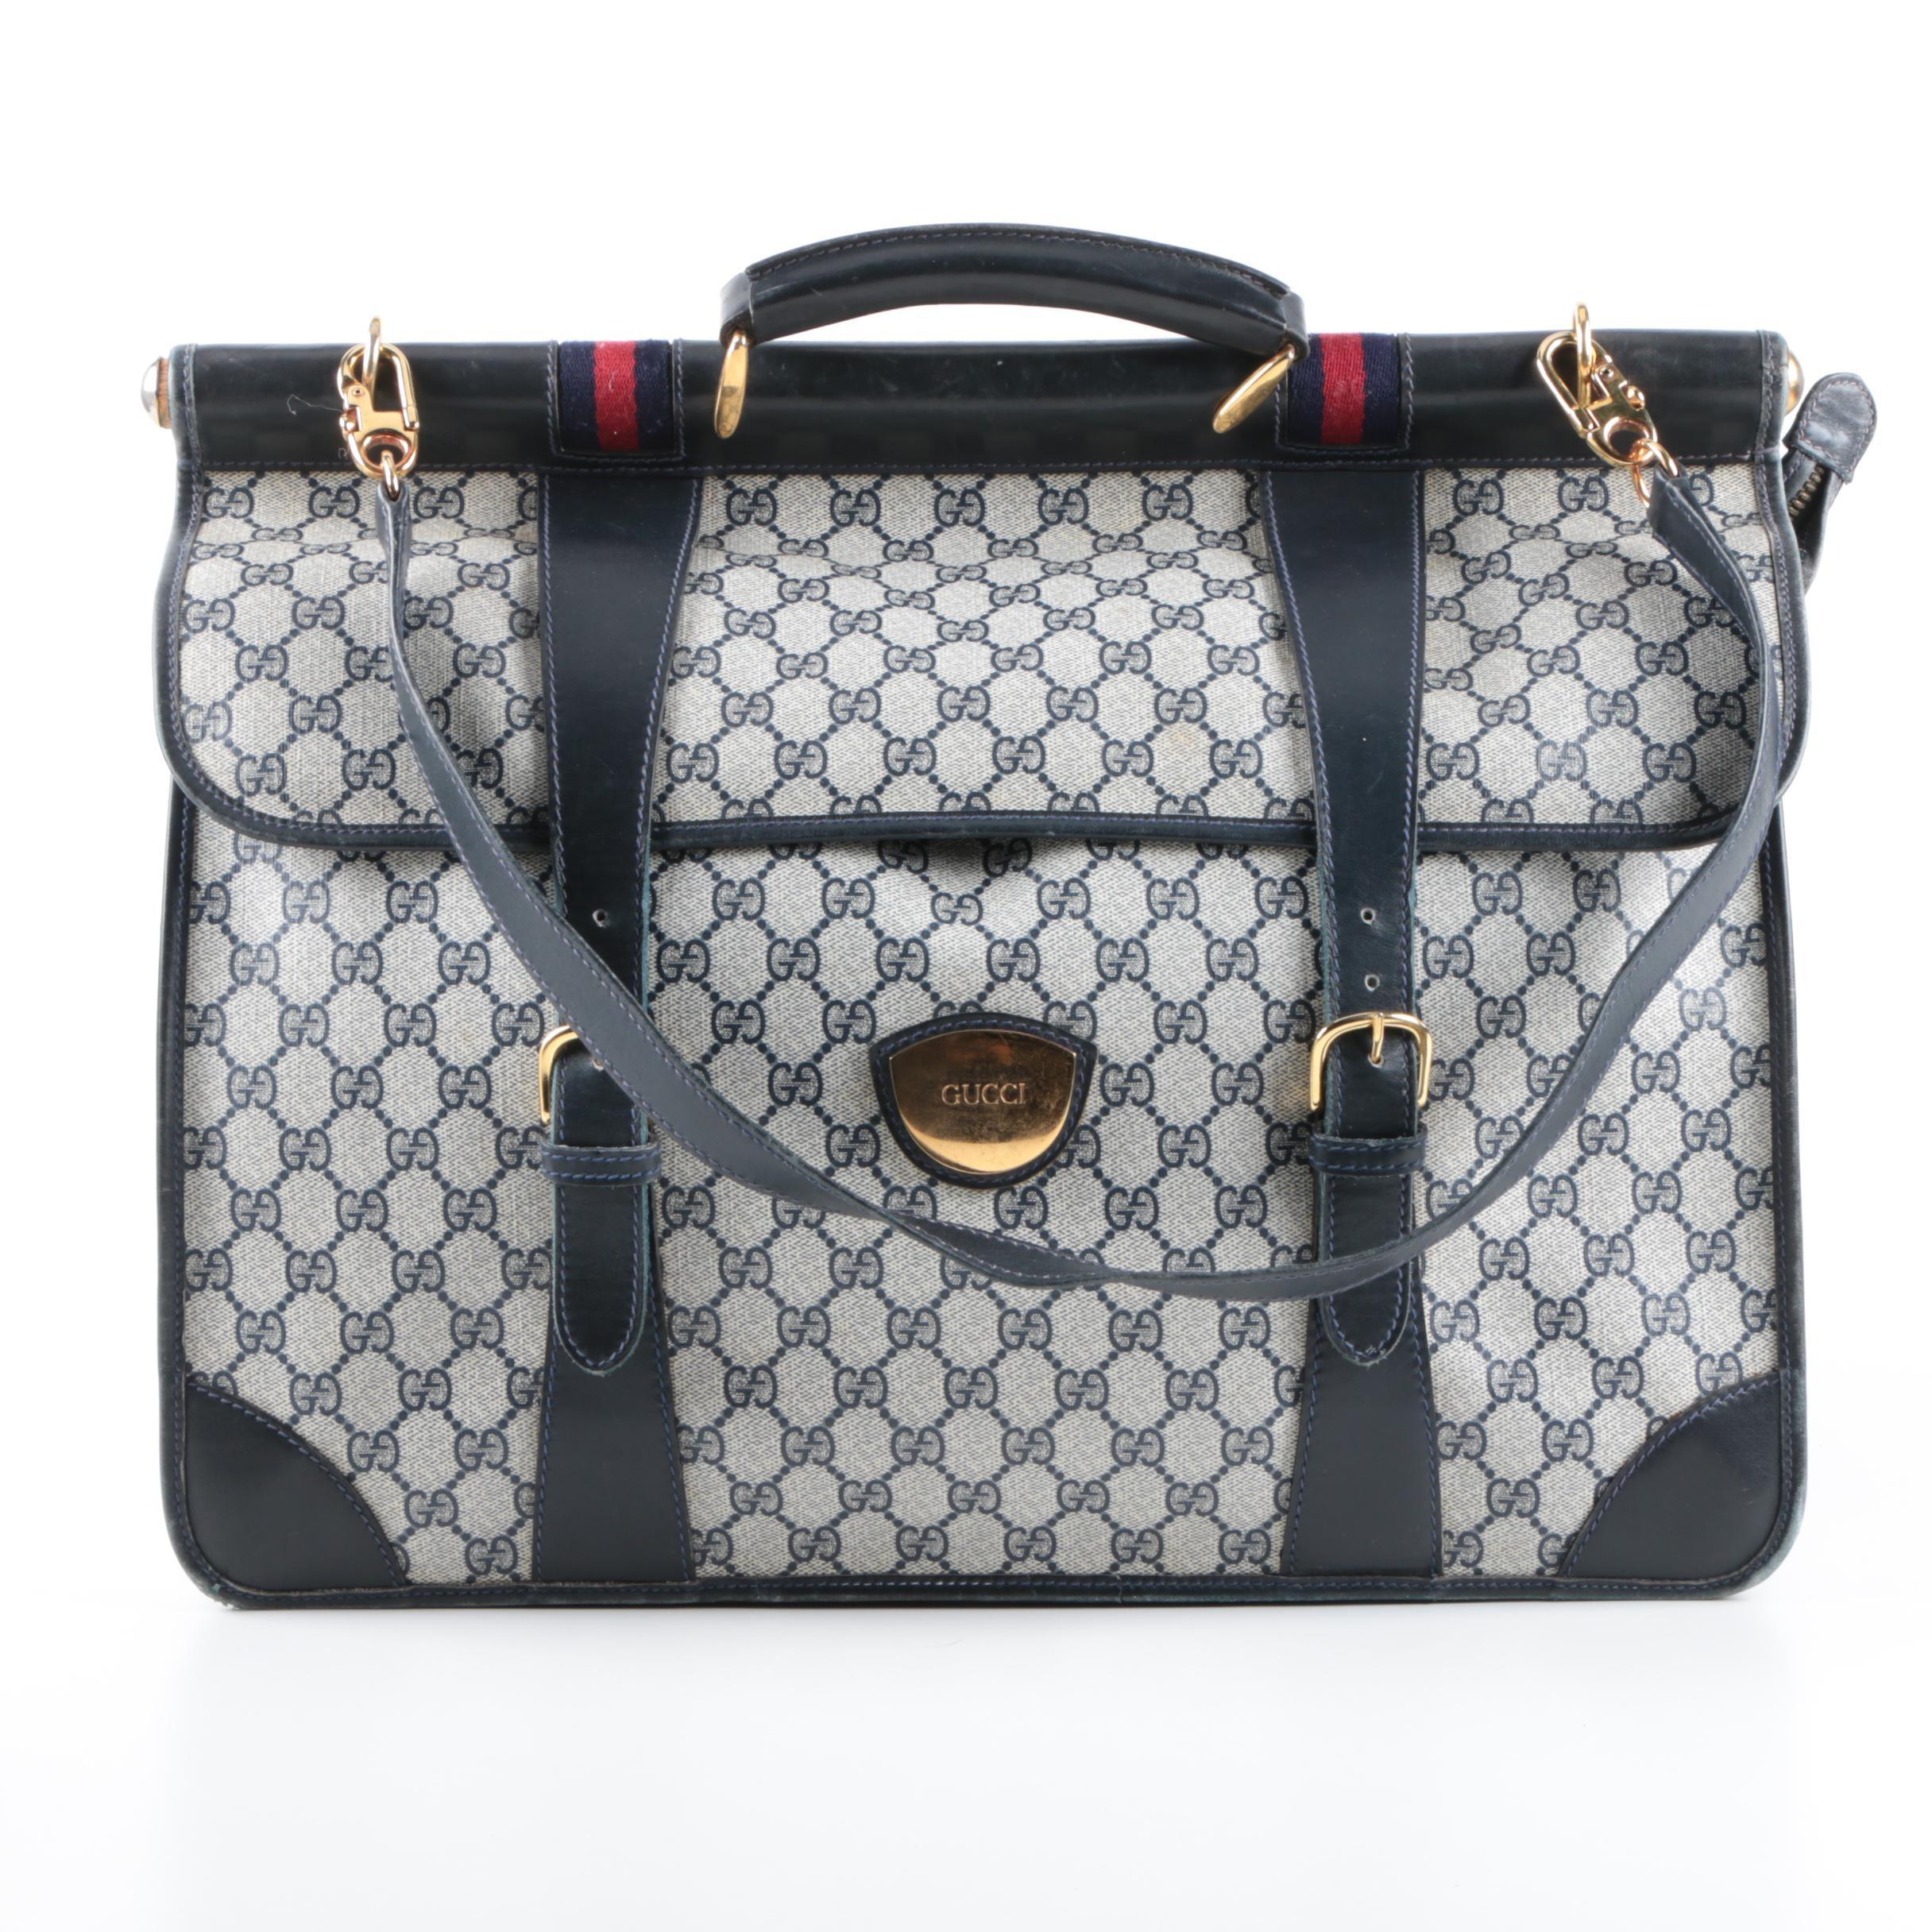 Vintage Gucci Supreme GG Canvas Weekend Bag